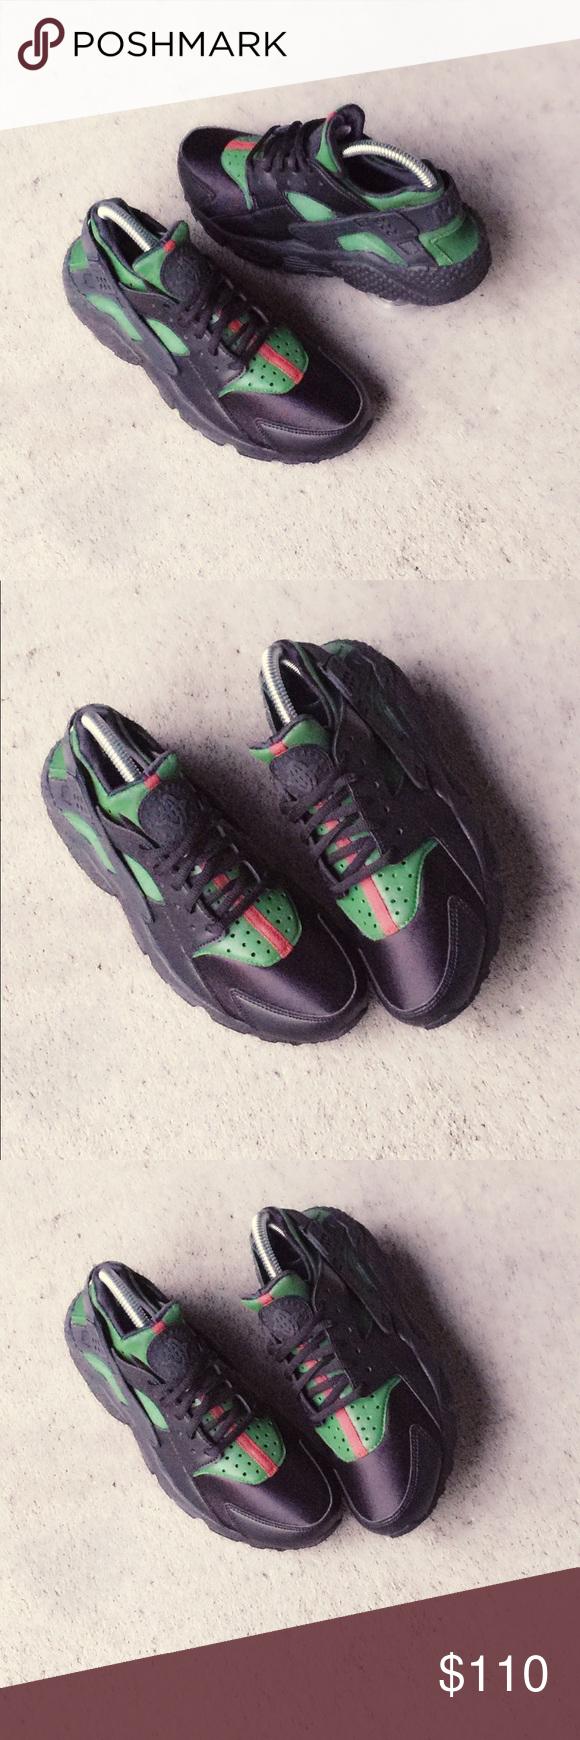 76395af0b5bf6c Custom Nike Huaraches Gucci Black Custom Nike huaraches Women Gucci Inspired  Women size 11 (run small) Nike Shoes Athletic Shoes